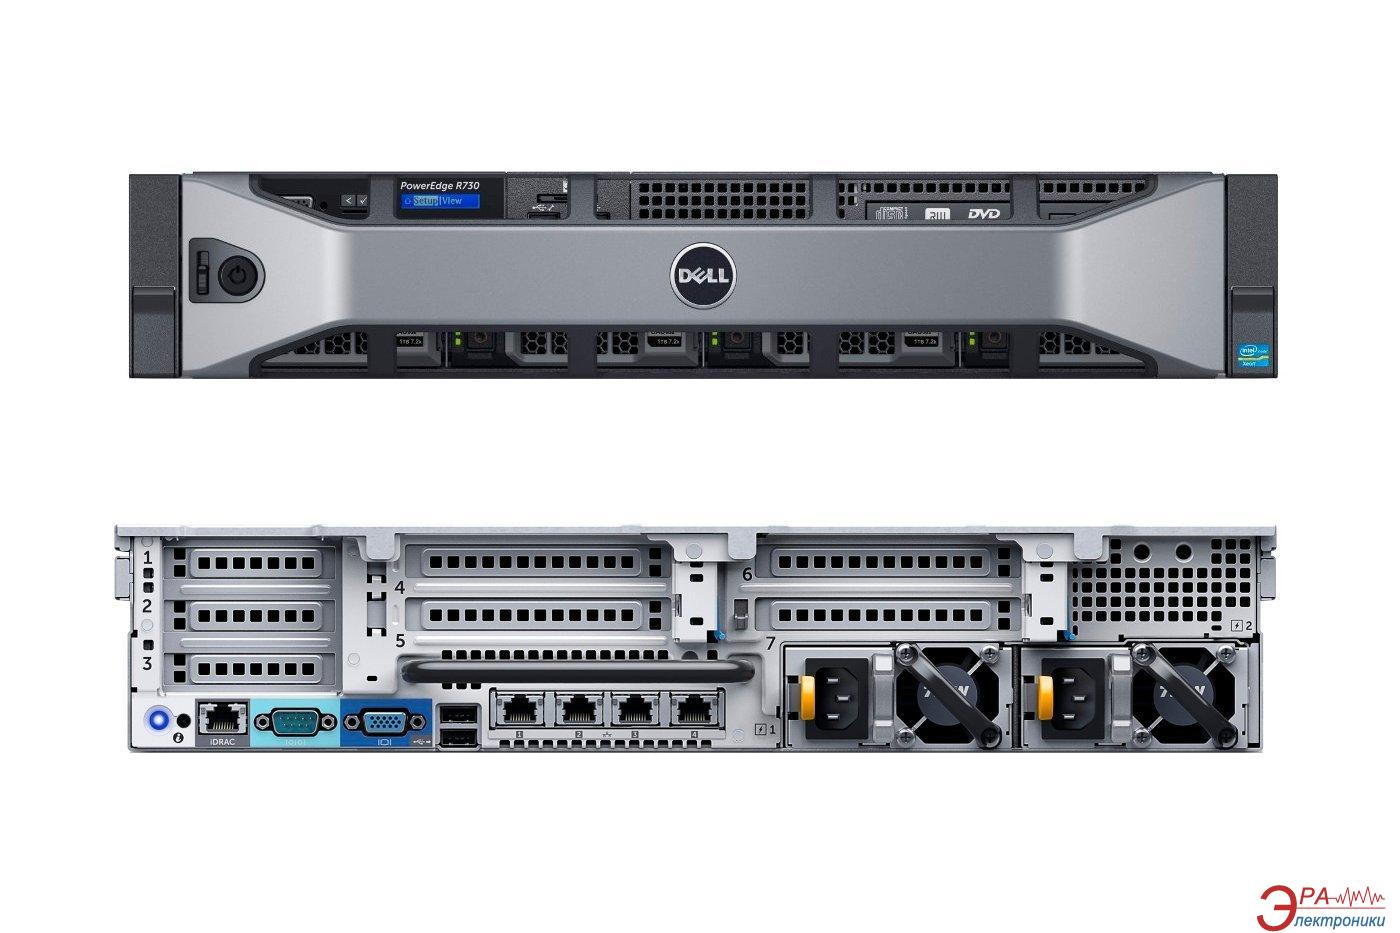 Сервер DELL PowerEdge R73 P11 (210-ACXU P12)